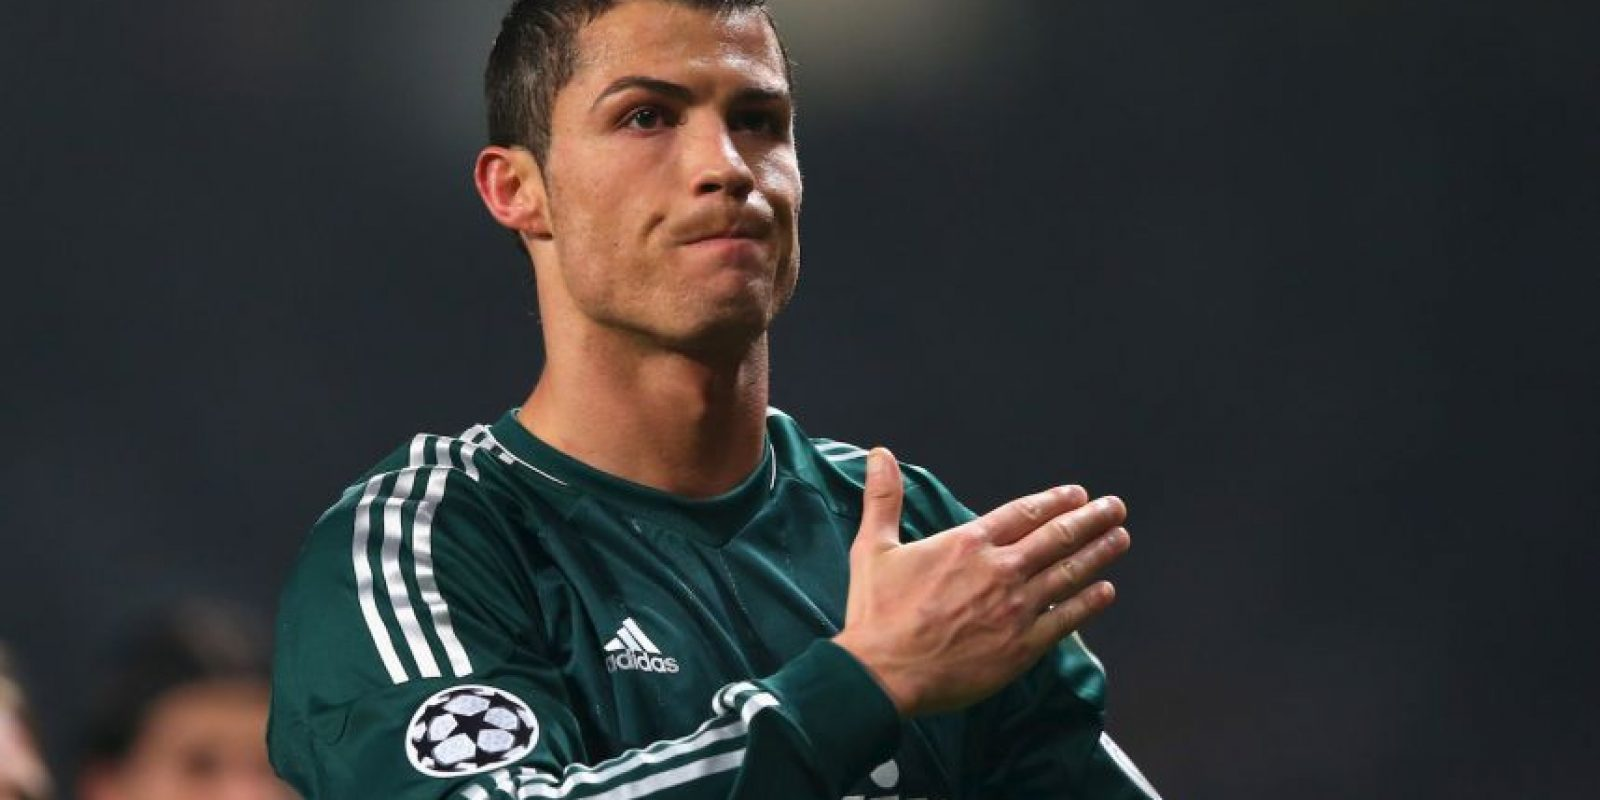 Cristiano Ronaldo en su vuelta a Old Trafford Foto:Getty Images